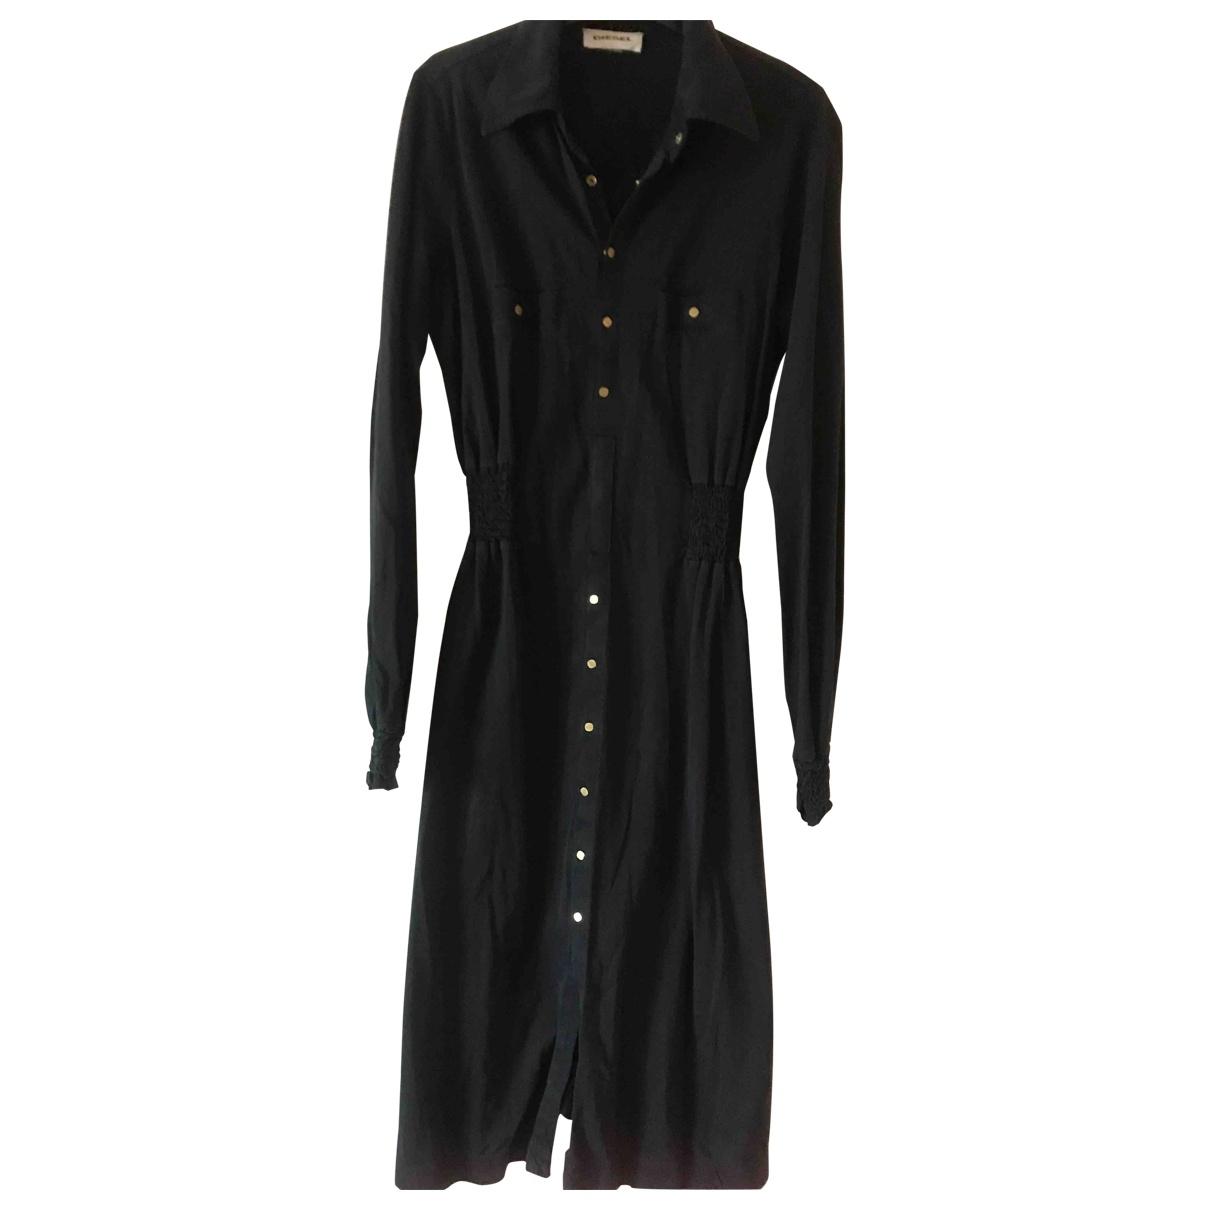 Diesel \N Black Cotton dress for Women S International